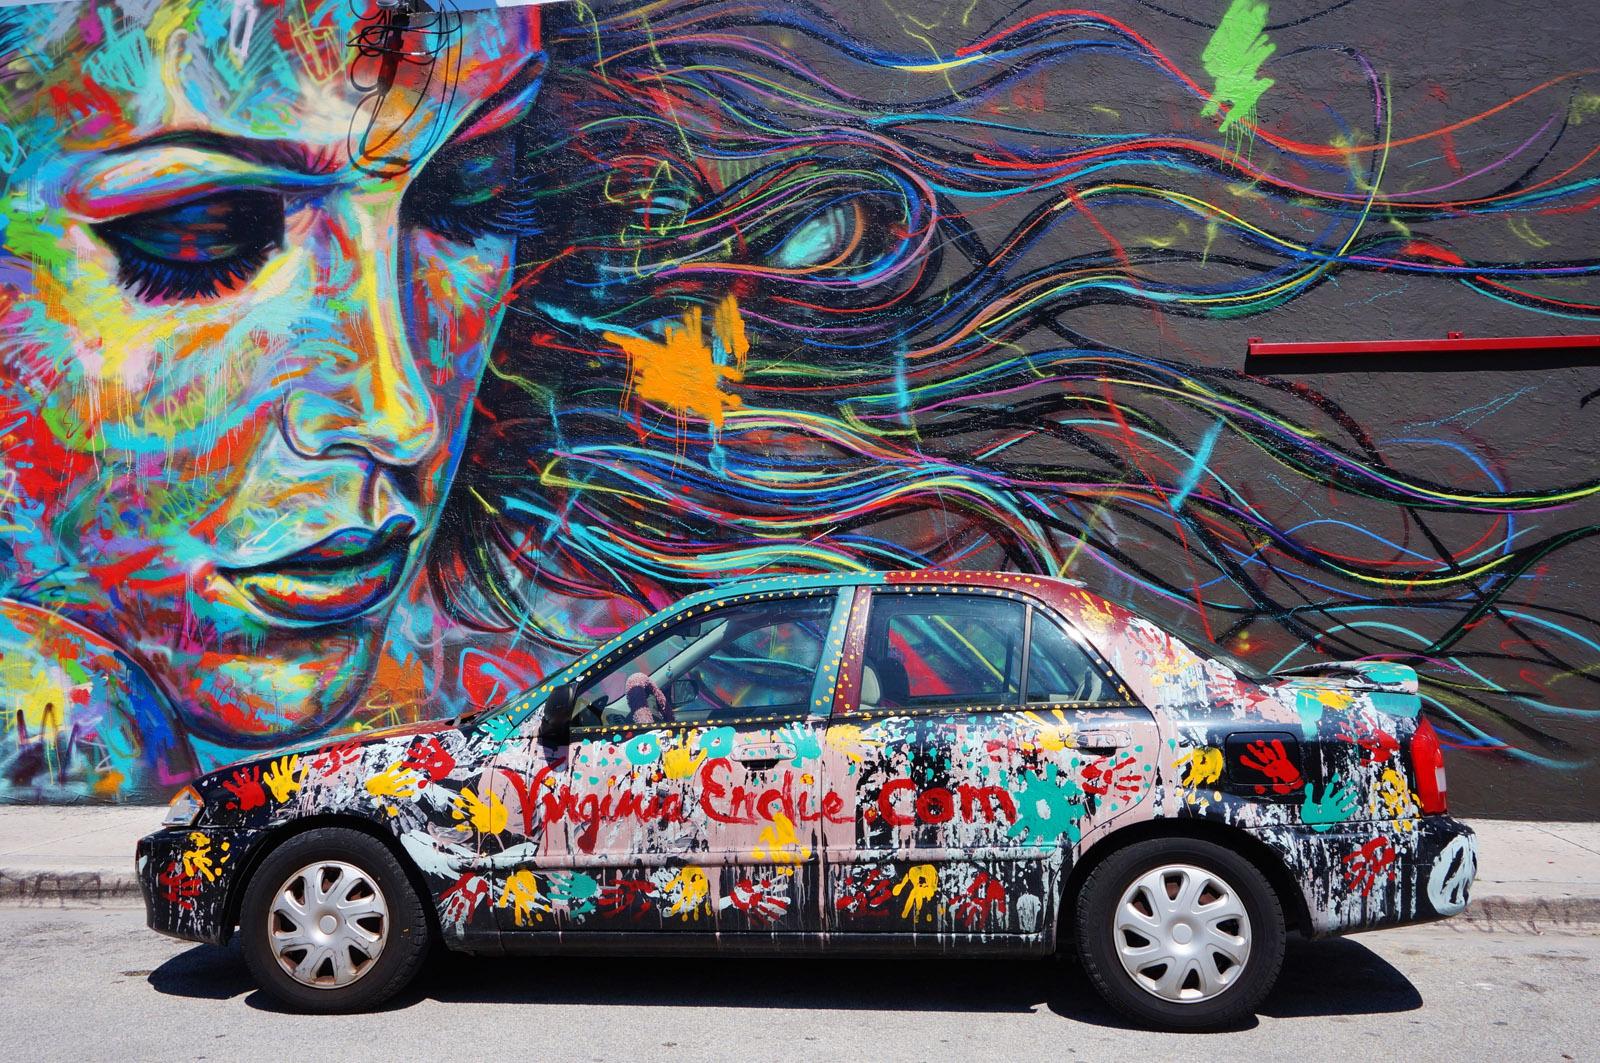 Spirit-&-Flesh-Magazine_The-Power-of-Graffiti_article_by_Julia-Wood_02